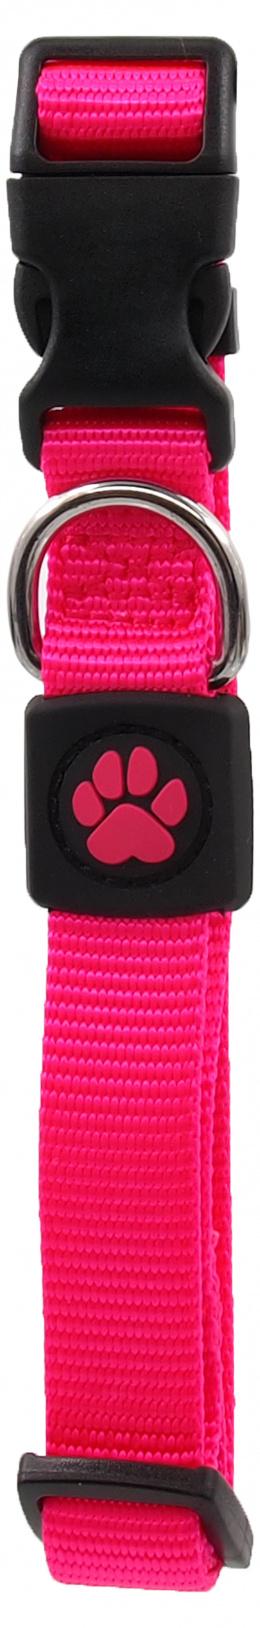 Obojek Active Dog Premium M růžový 2x34-49cm